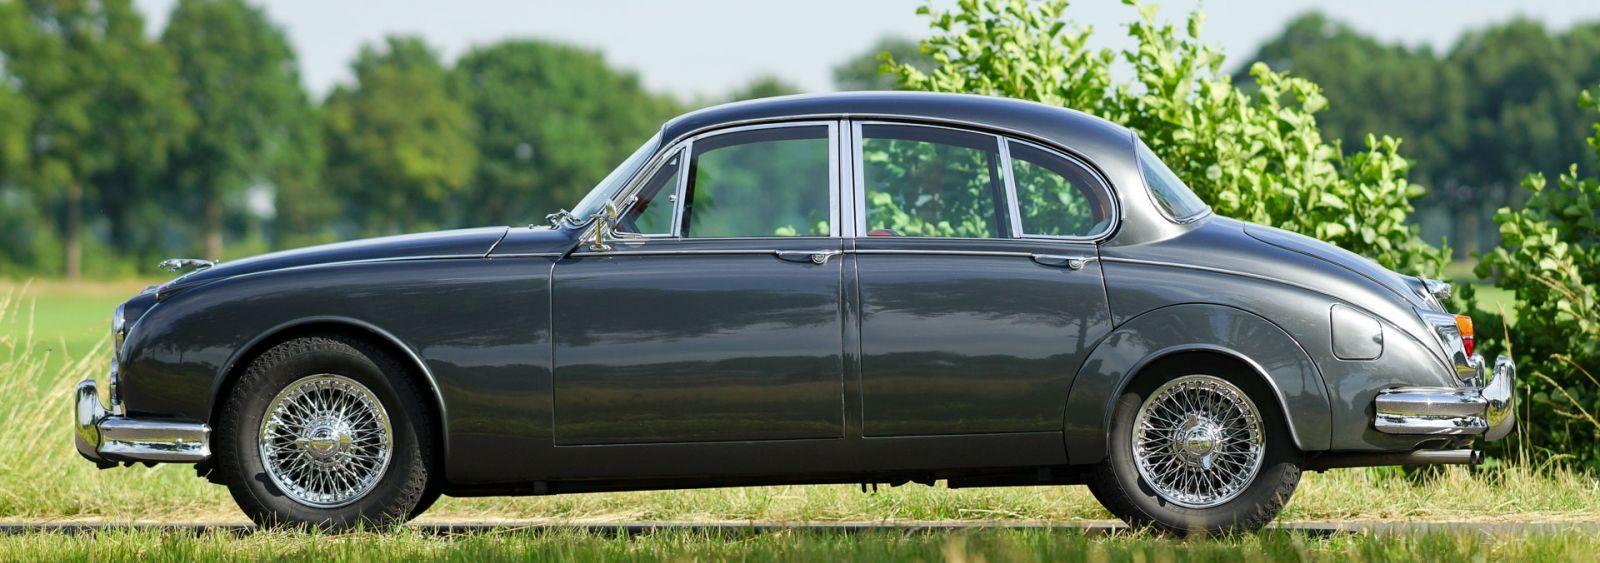 Jaguar Mk II 3.8 Litre, 1964 - Classicargarage - NL